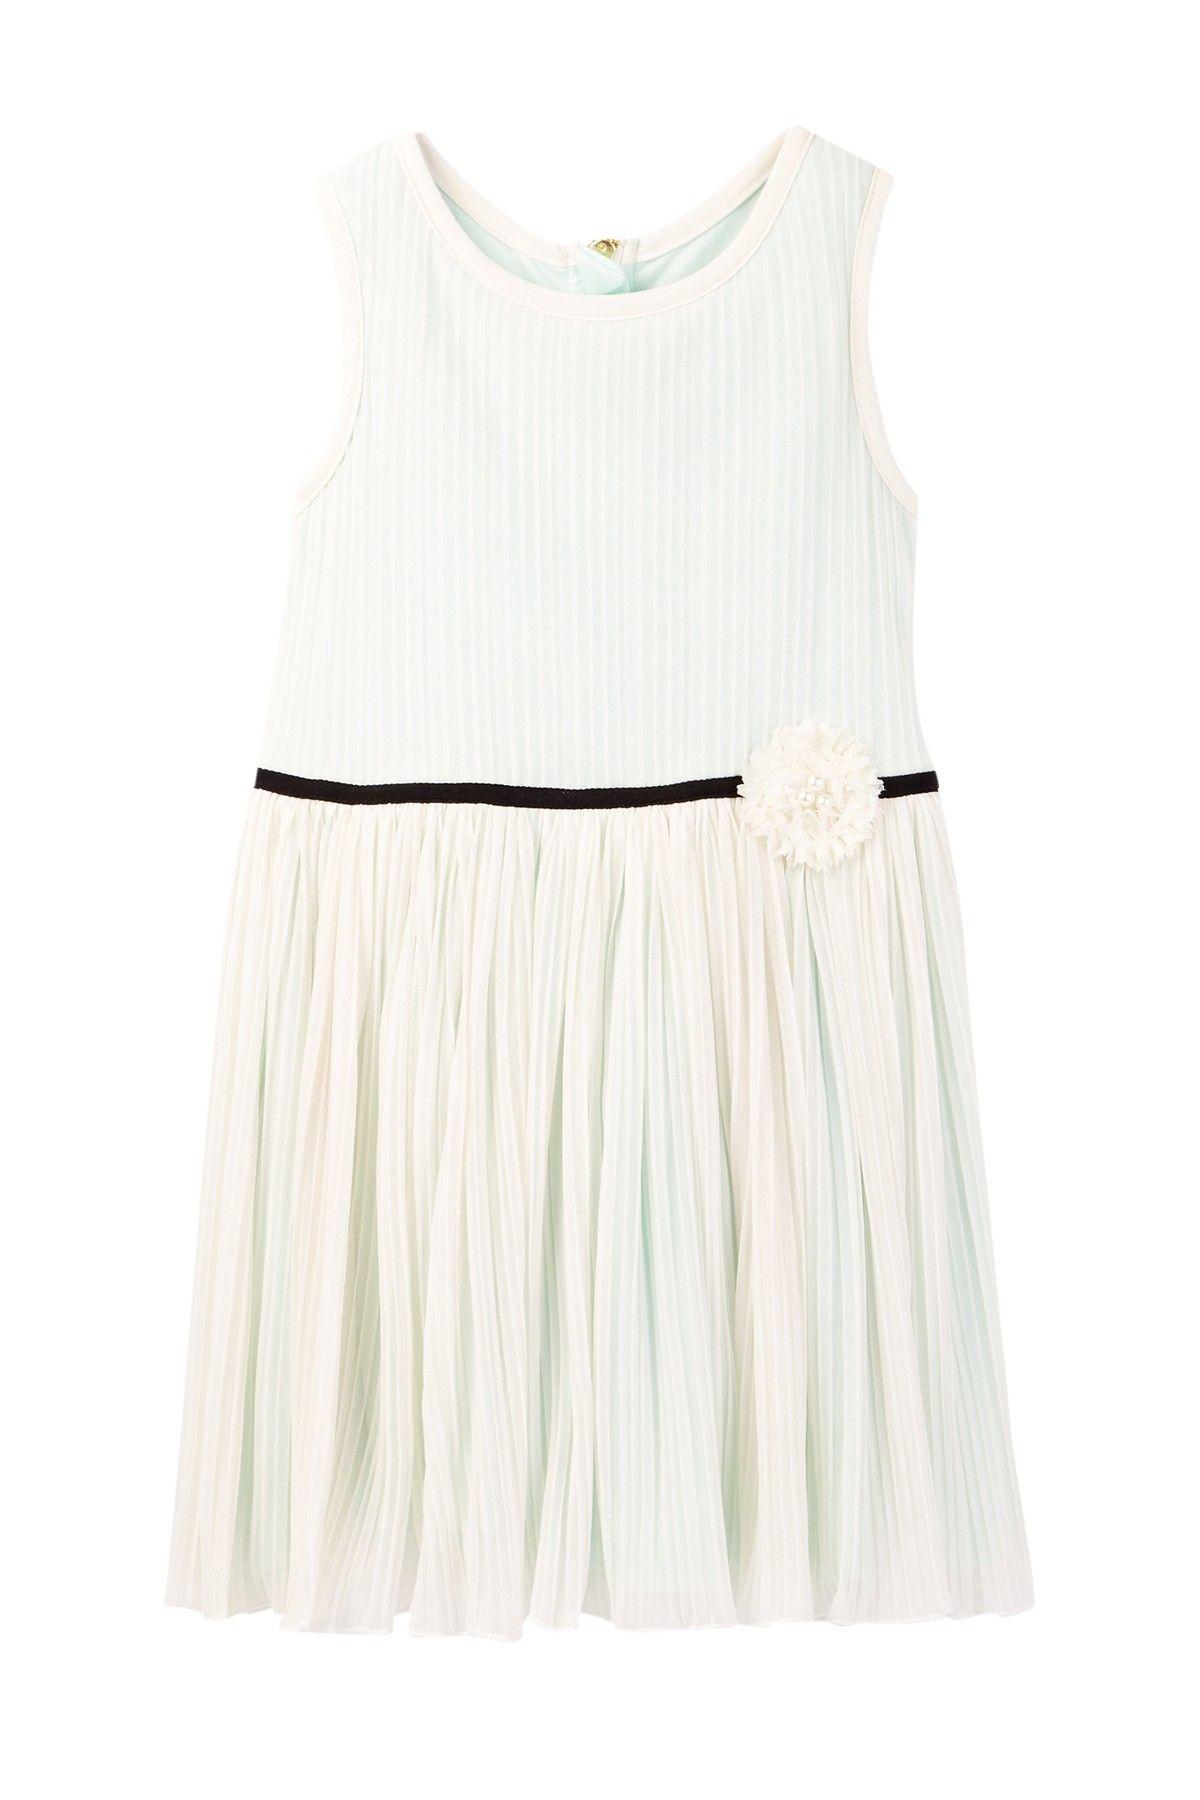 Pippa Julie Chiffon Overlay Dress Nordstrom Rack Flapper Inspired Dress Overlay Dress Dresses [ 1800 x 1200 Pixel ]